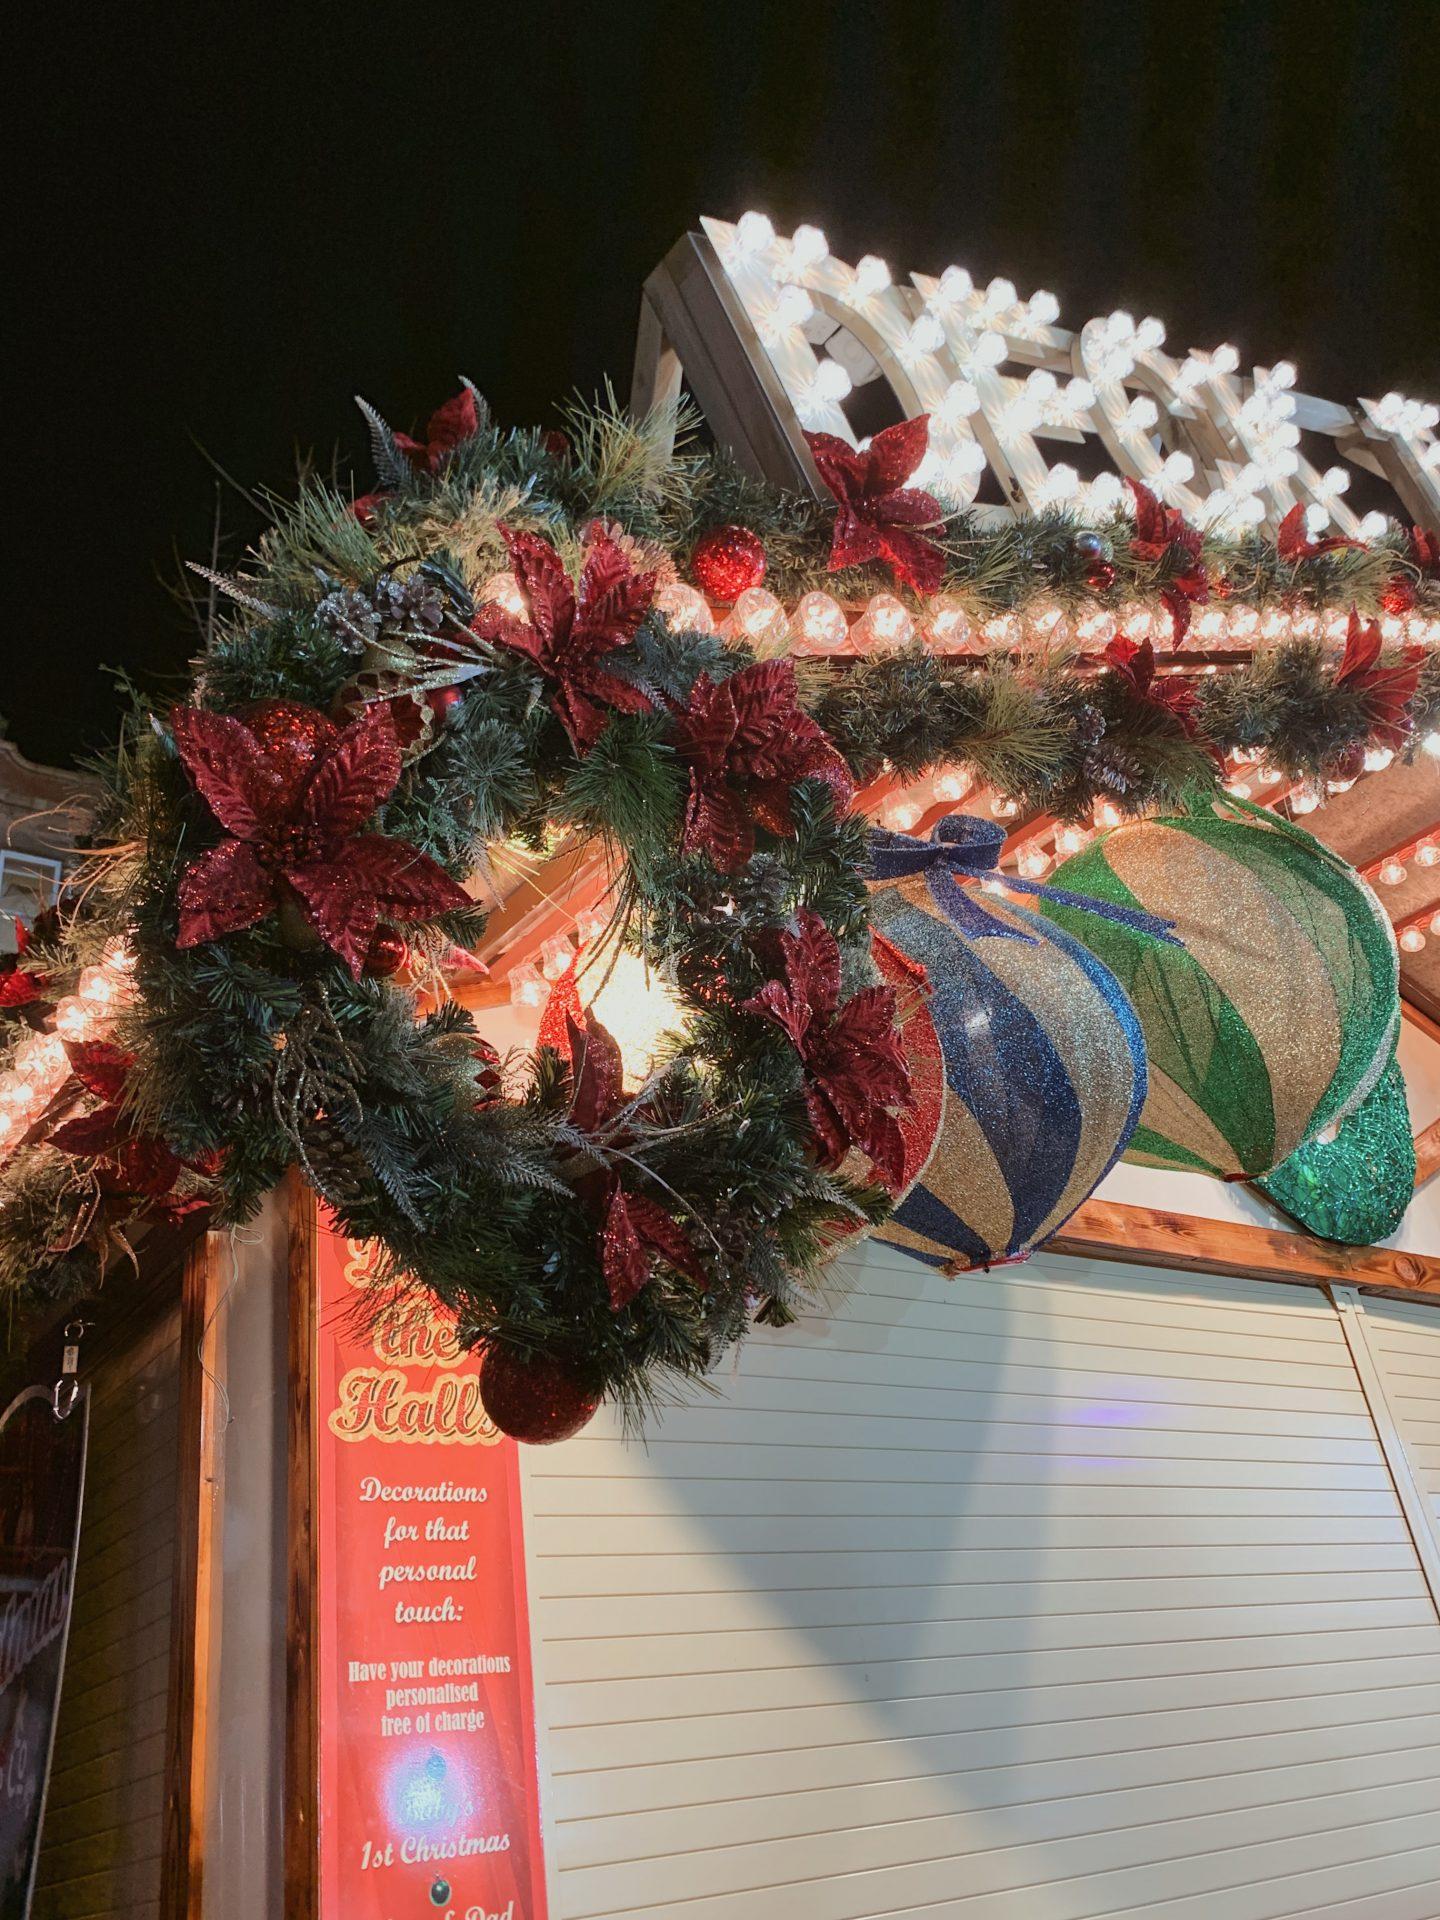 Nottingham Winter Wonderland, Nottingham Winter Wonderland 2019, Nottingham Christmas Market, Christmas Markets East Midlands,